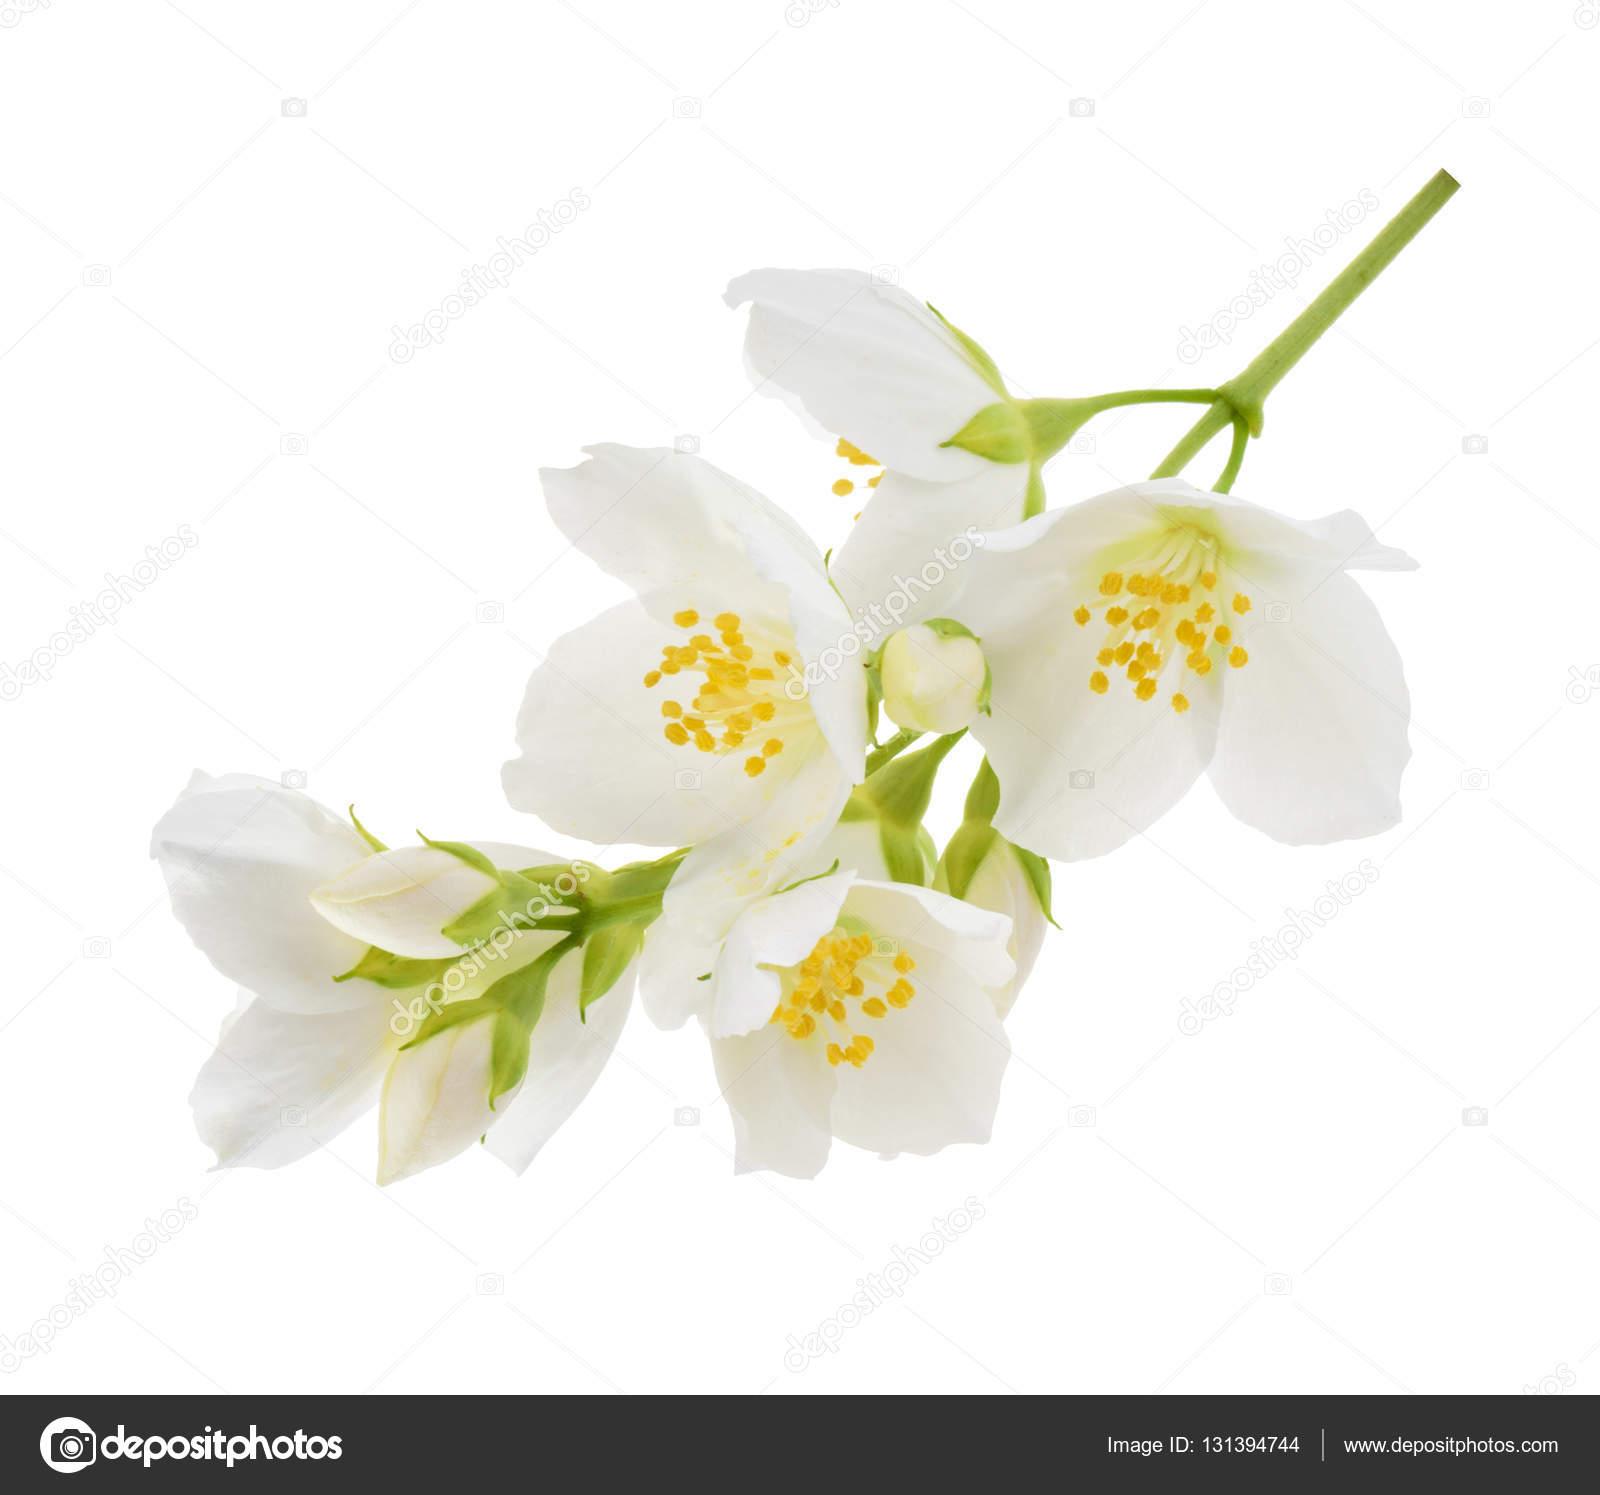 Jasmine flower isolated on white stock photo ovydyborets 131394744 jasmine flower isolated on white stock photo izmirmasajfo Gallery